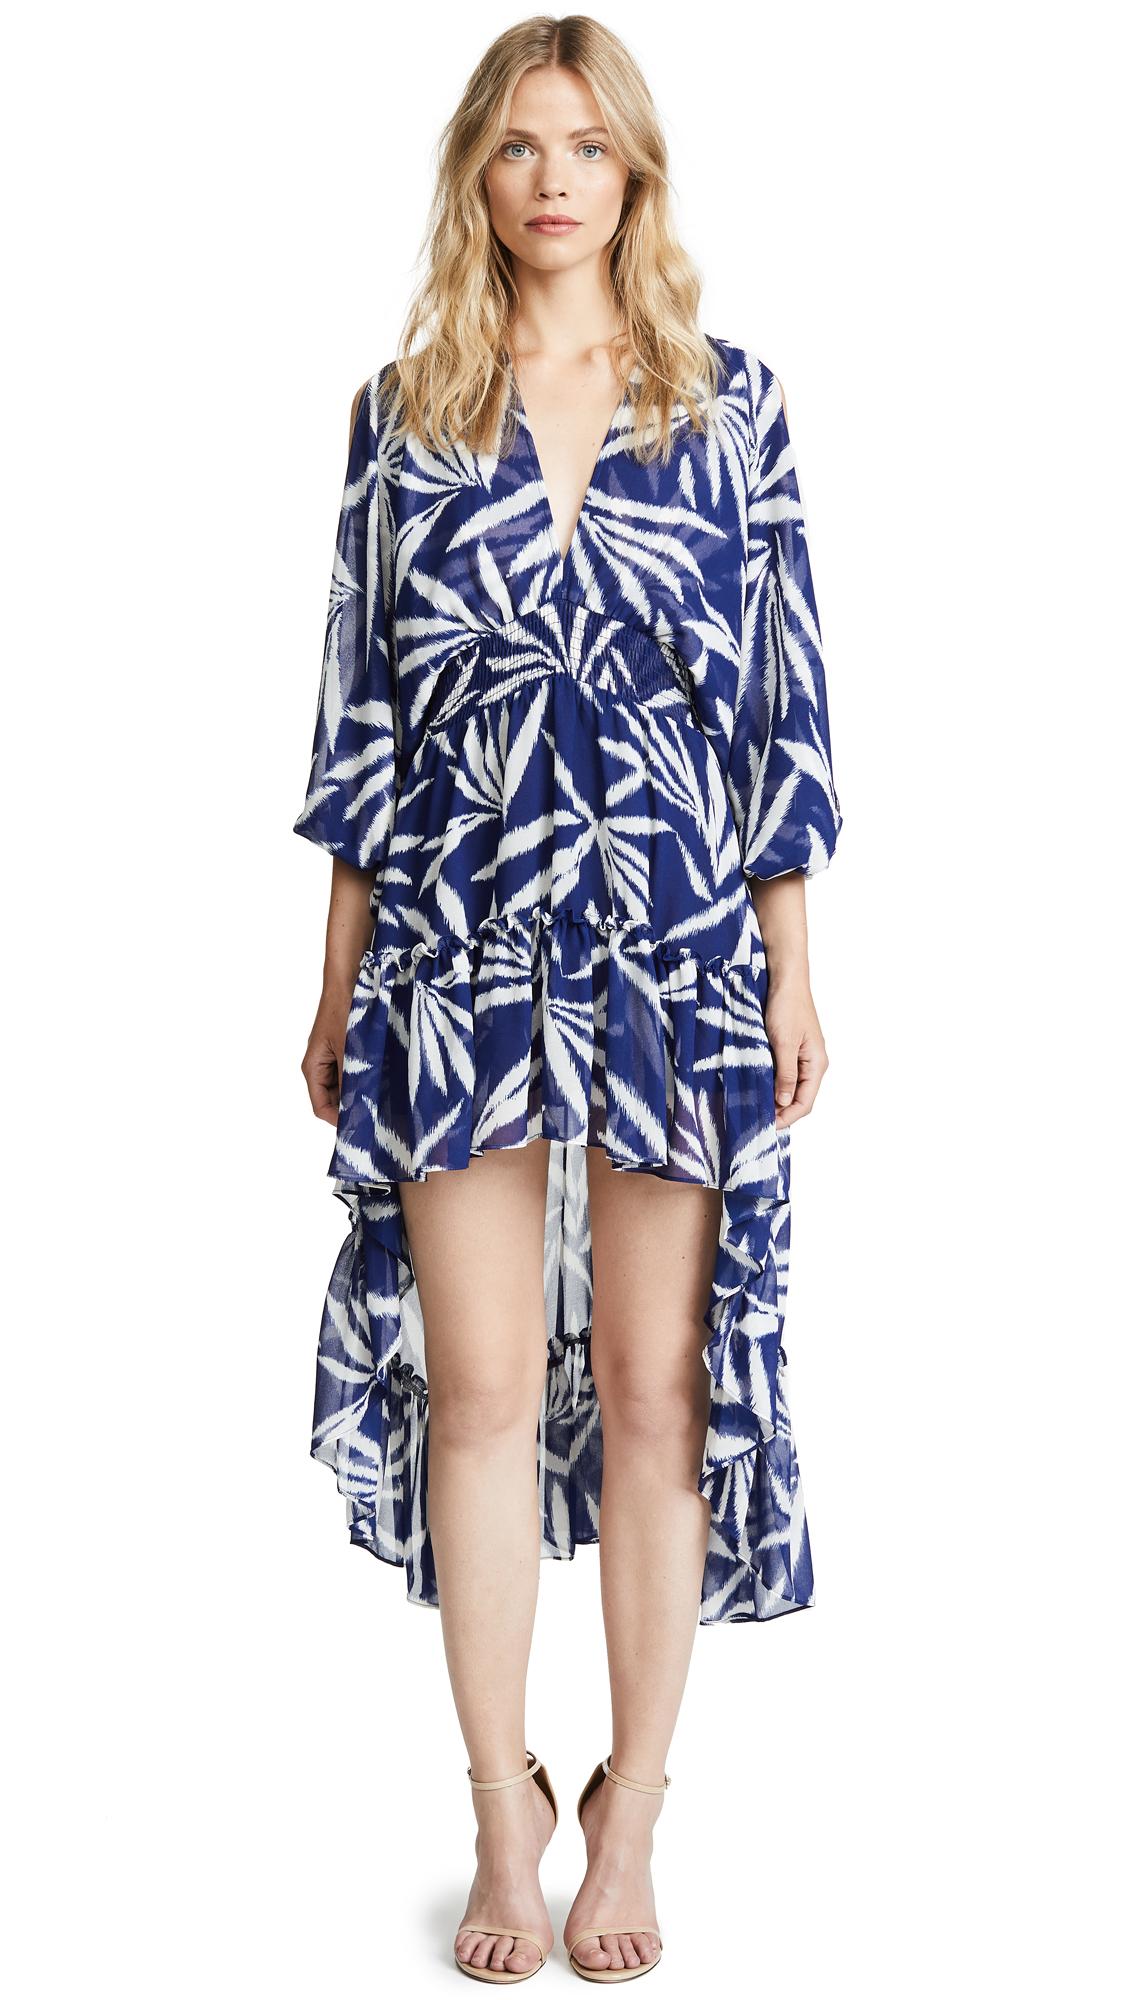 MISA Seda Dress In Blue